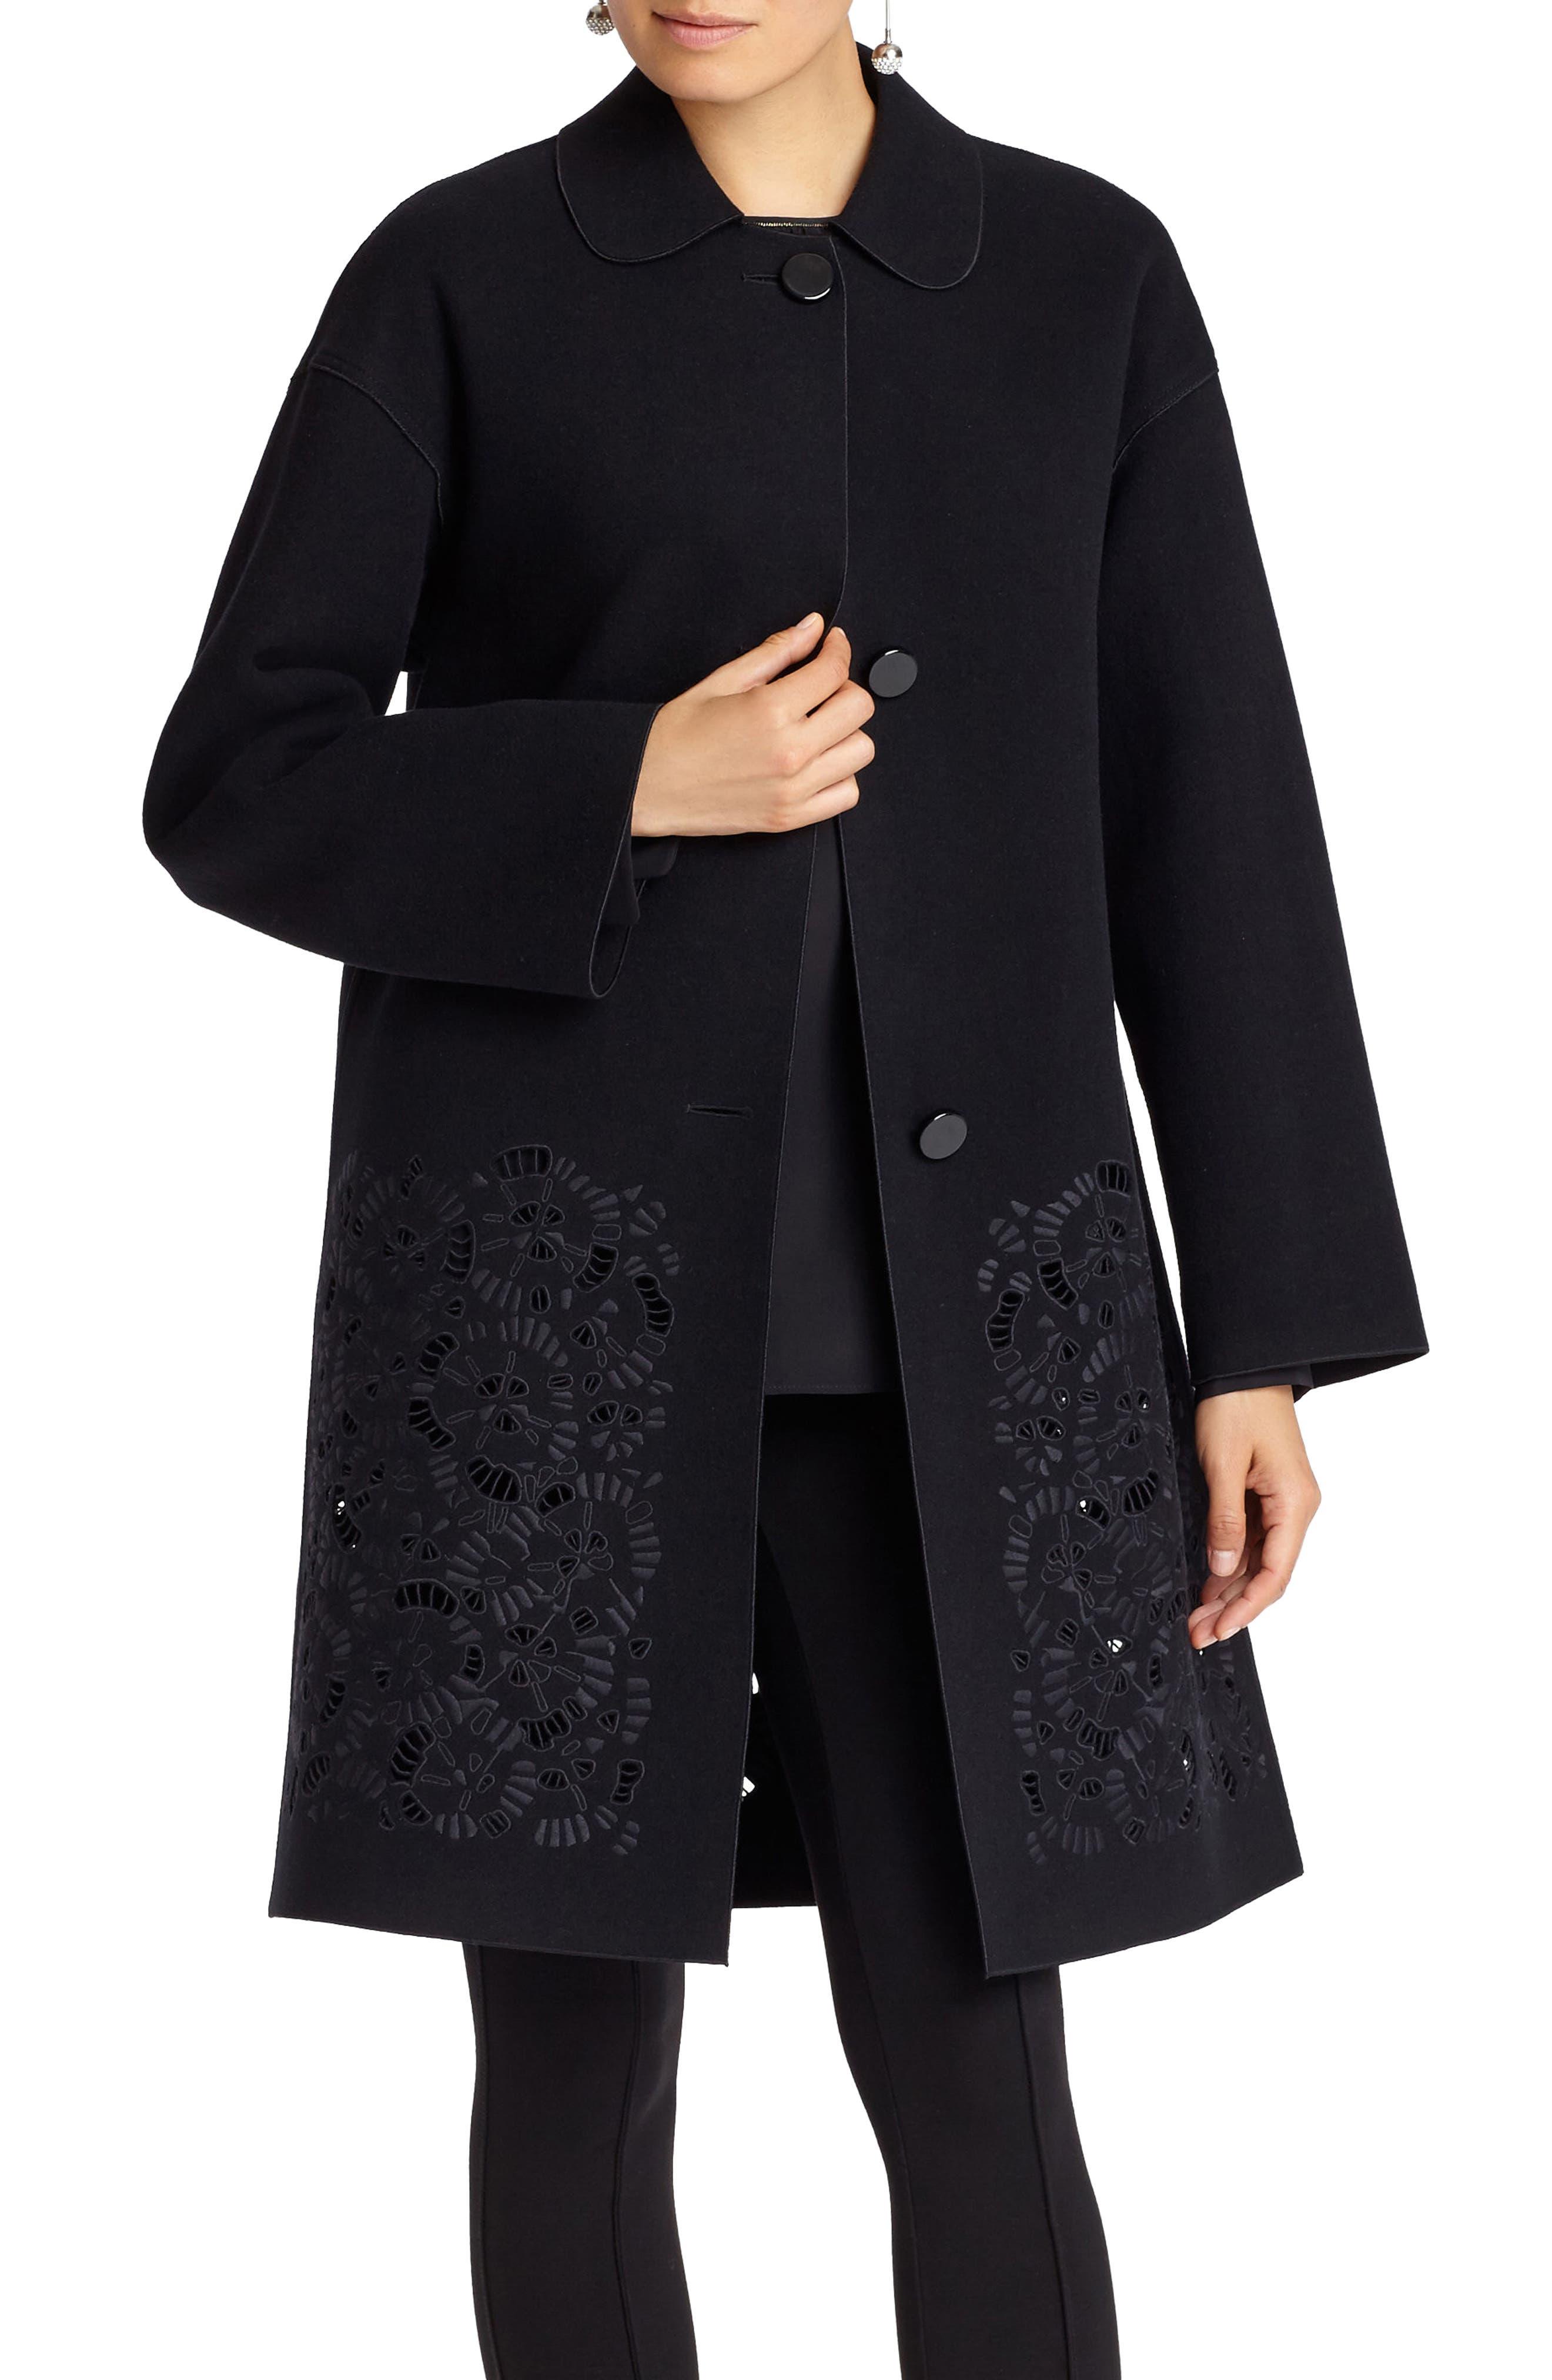 Vita Laser Cut Embroidered Coat,                             Main thumbnail 1, color,                             001